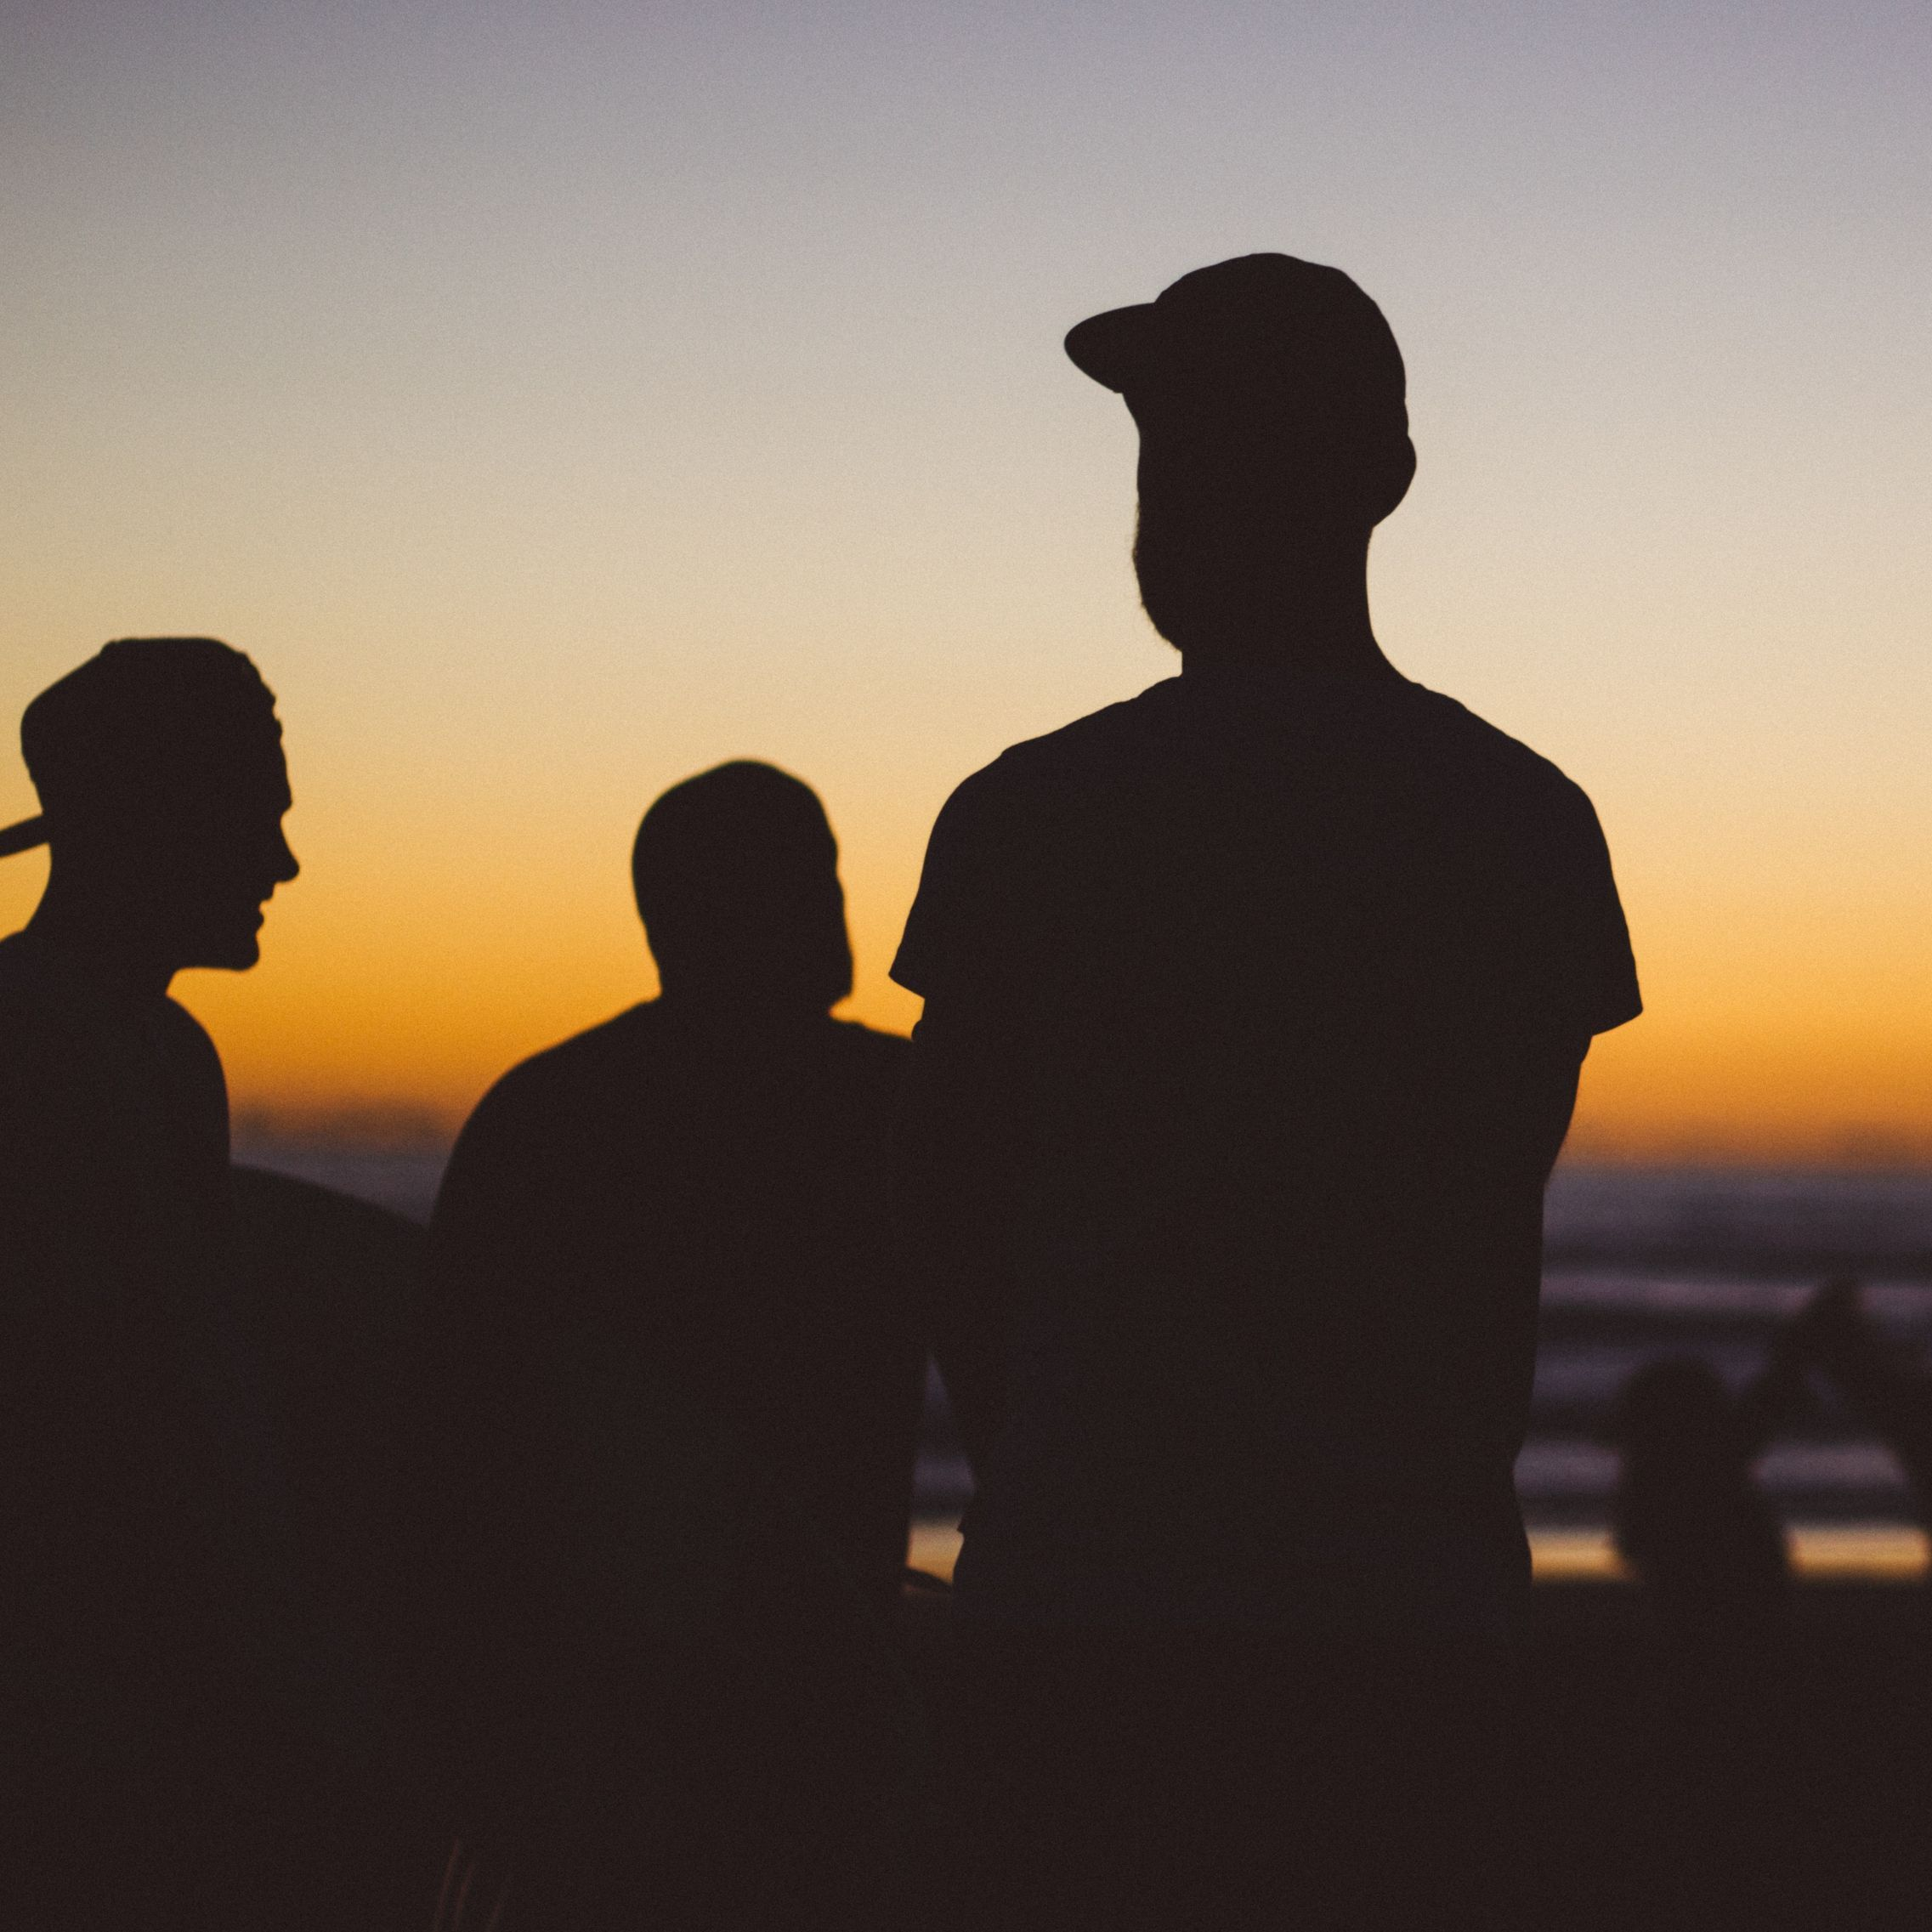 leadership silhouette (1)